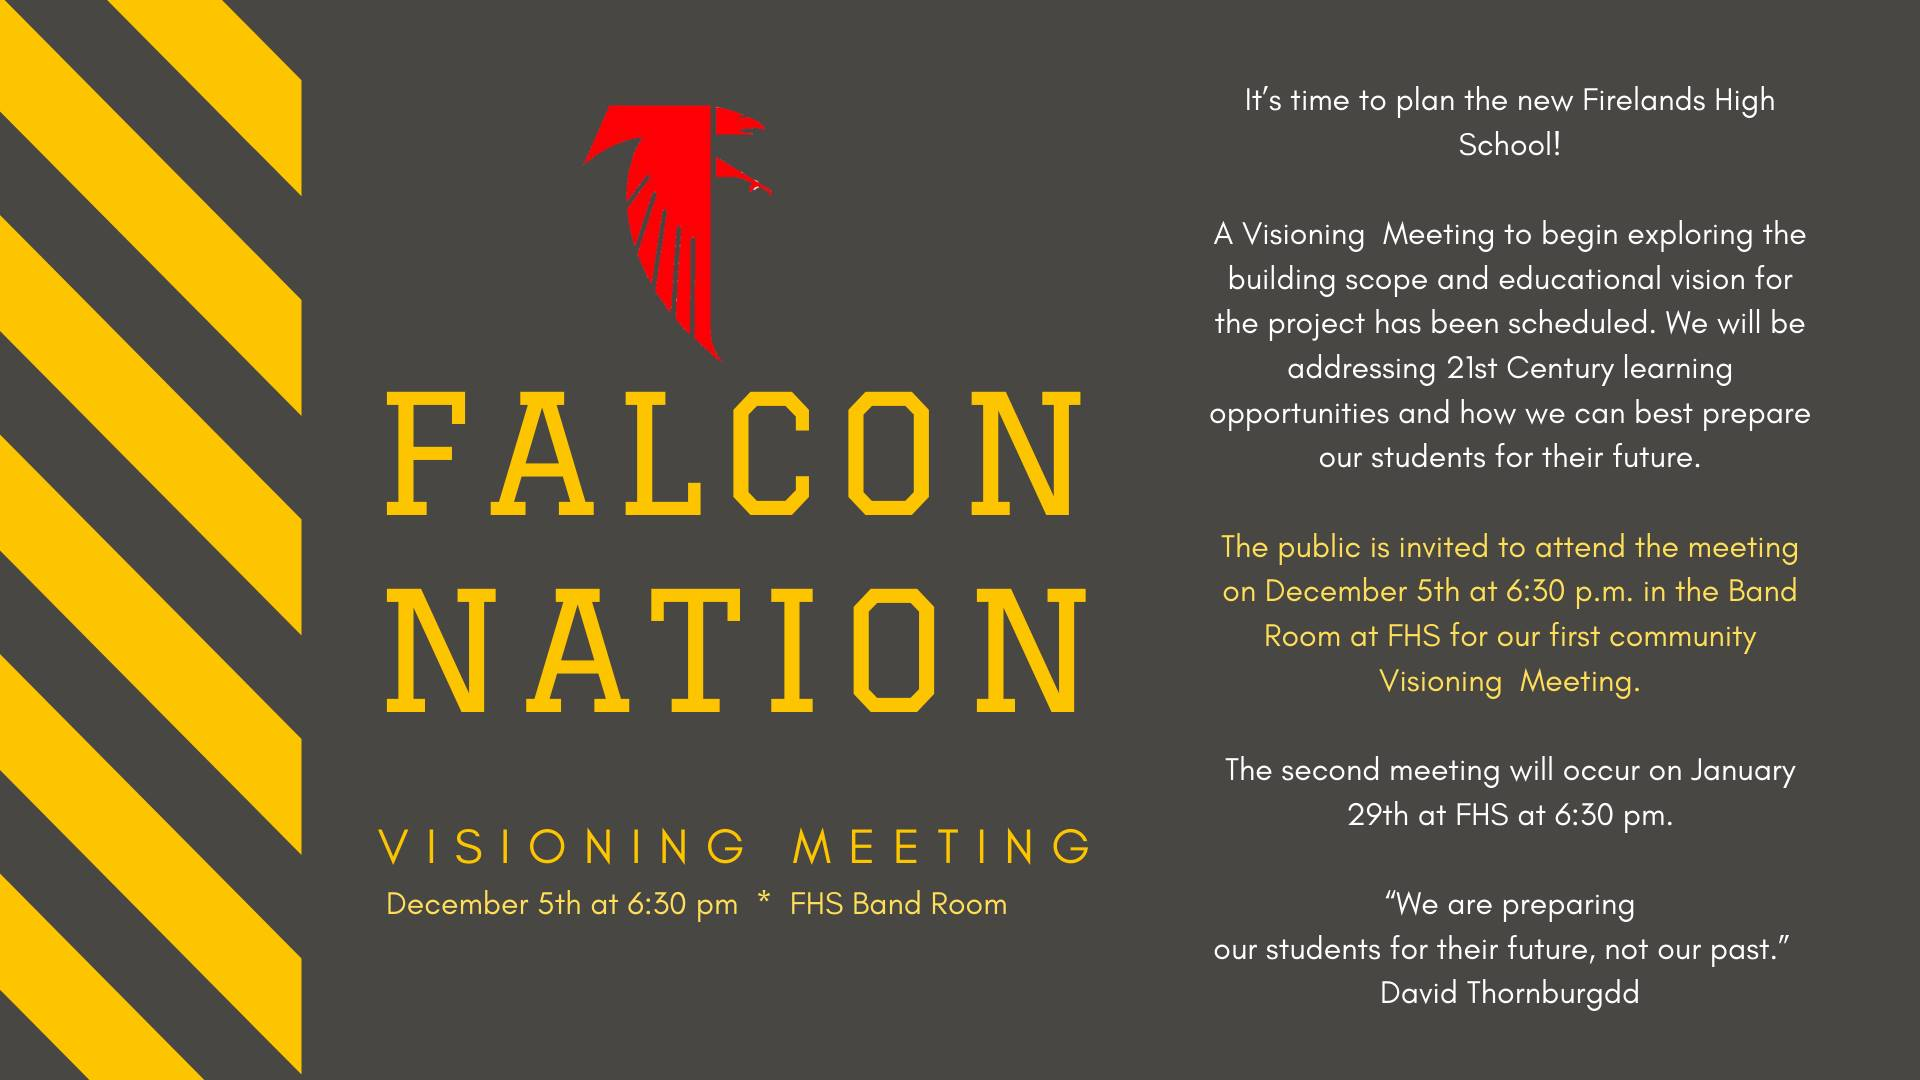 Visioning Meeting